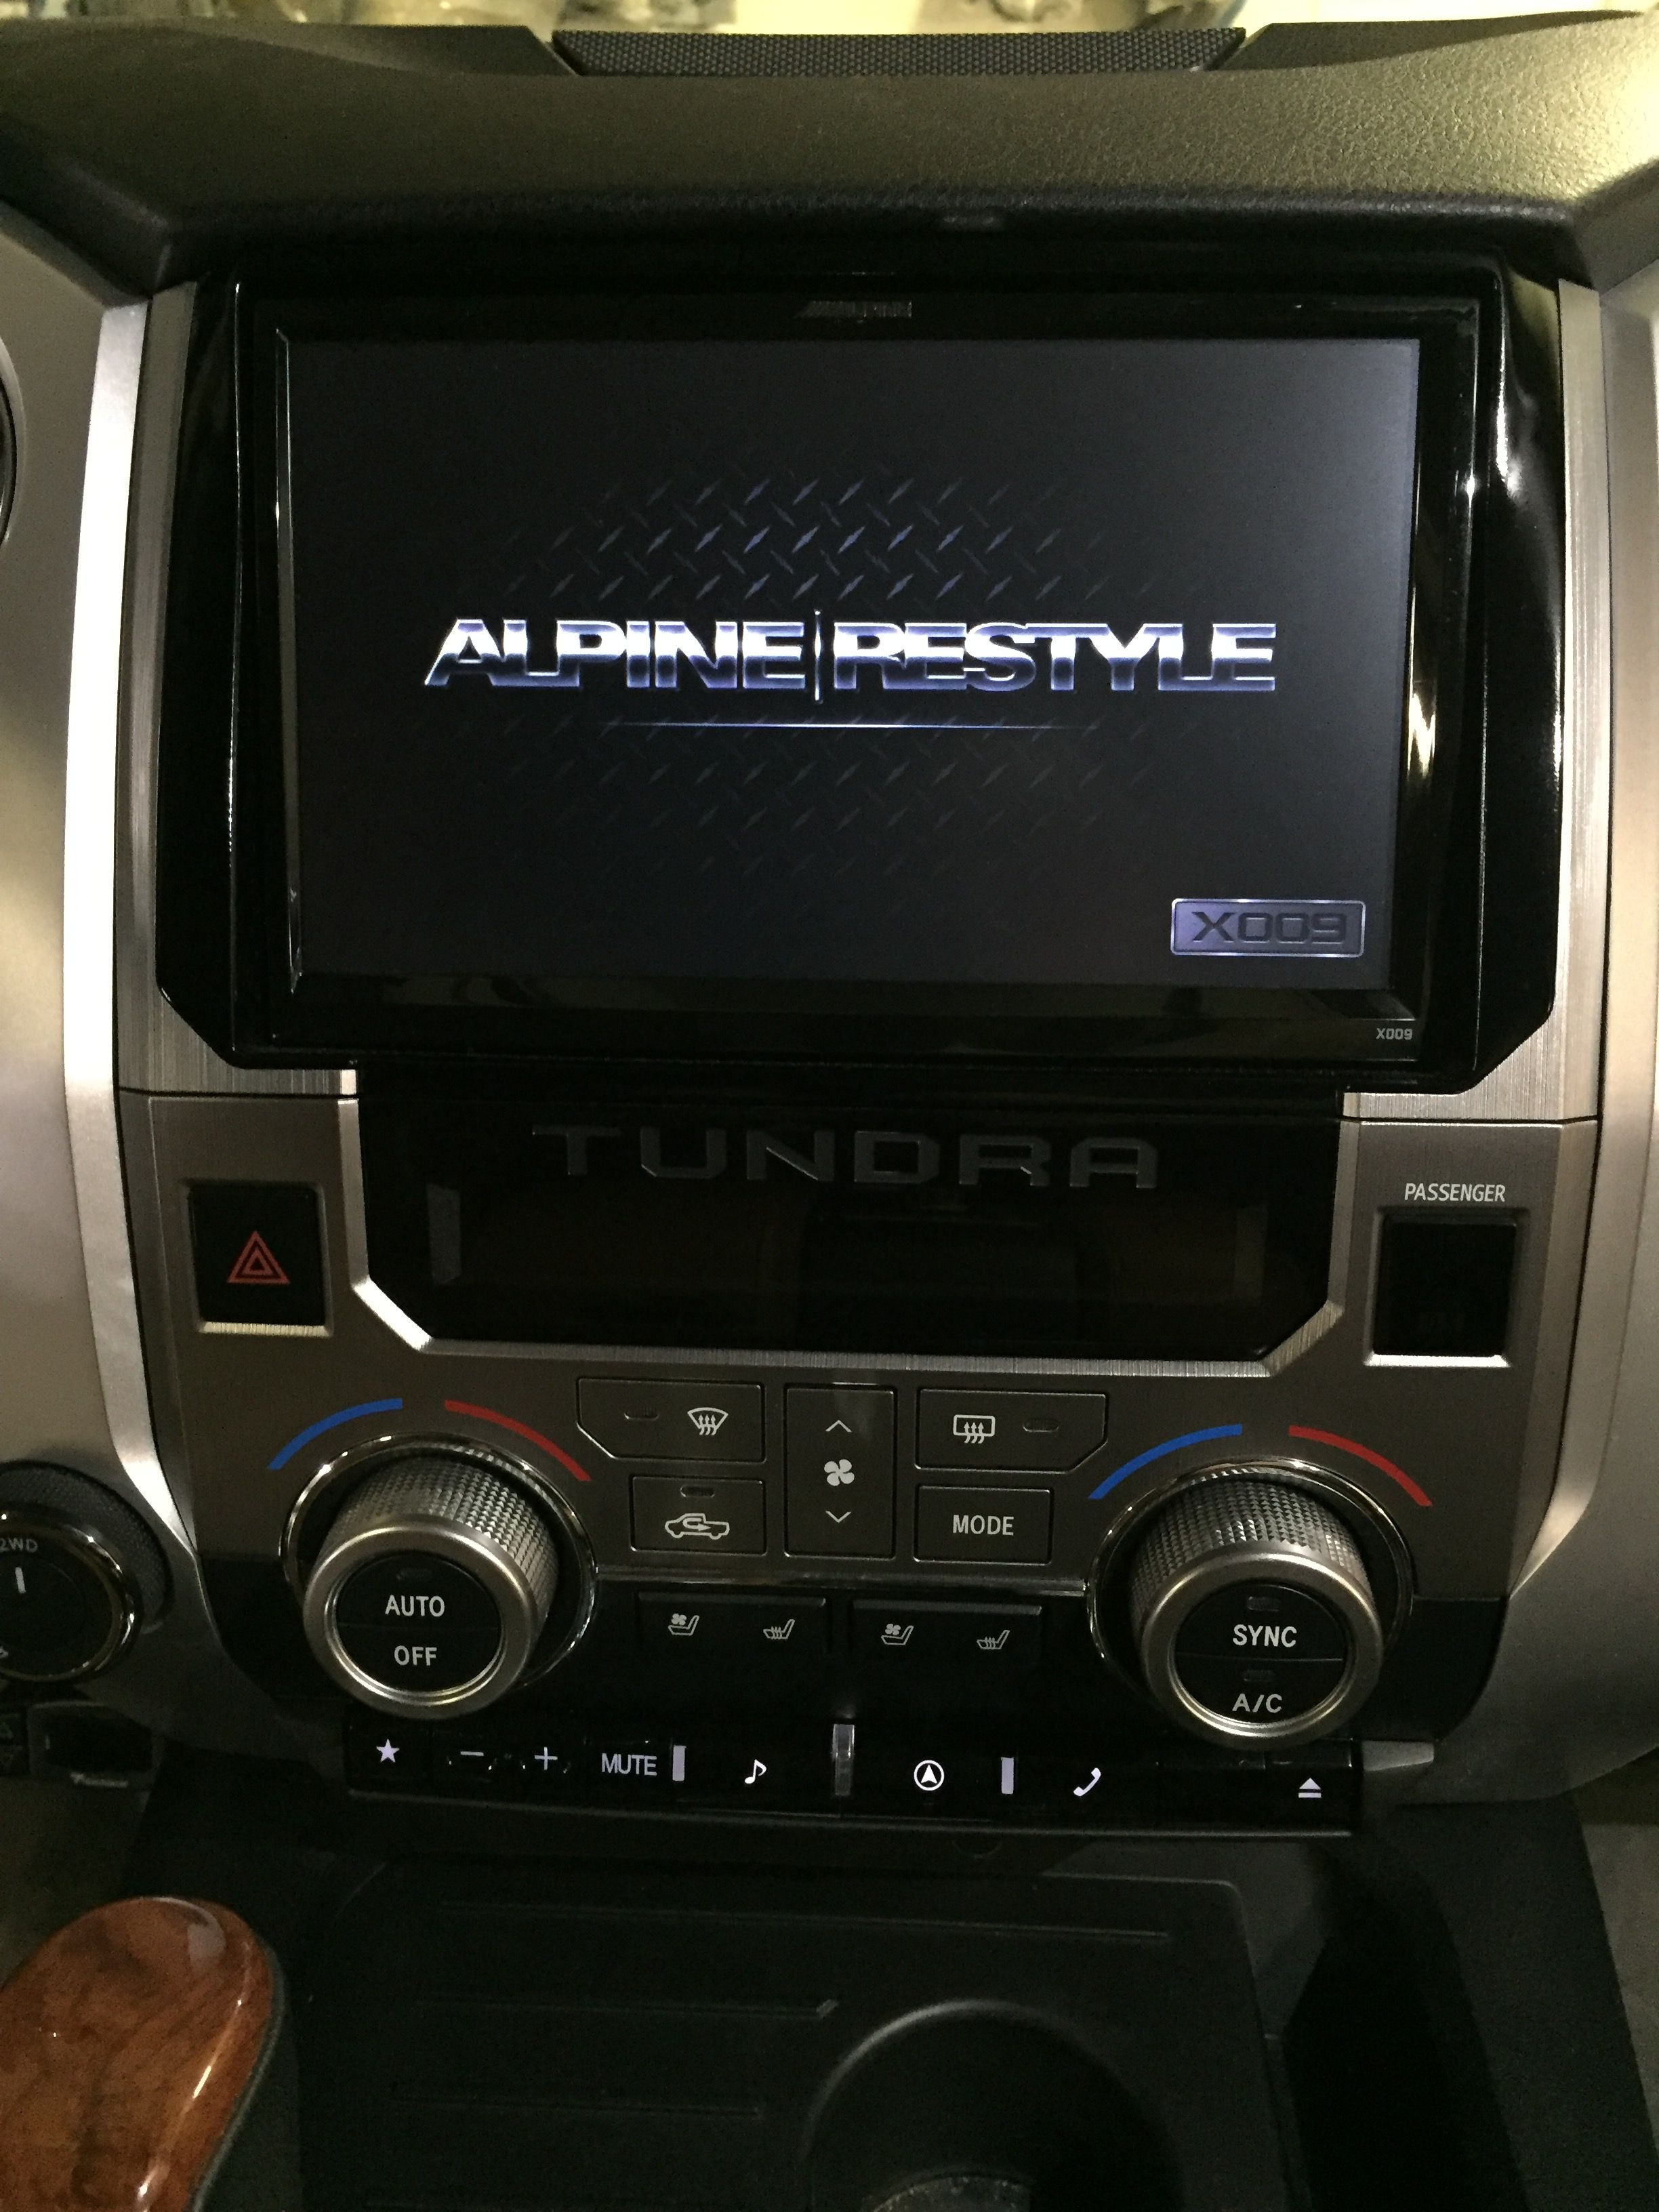 Alpine X 009 2014 Toyota Tundra 1794 Toyota Tundra 1794 Toyota Tundra Accessories Toyota Tundra